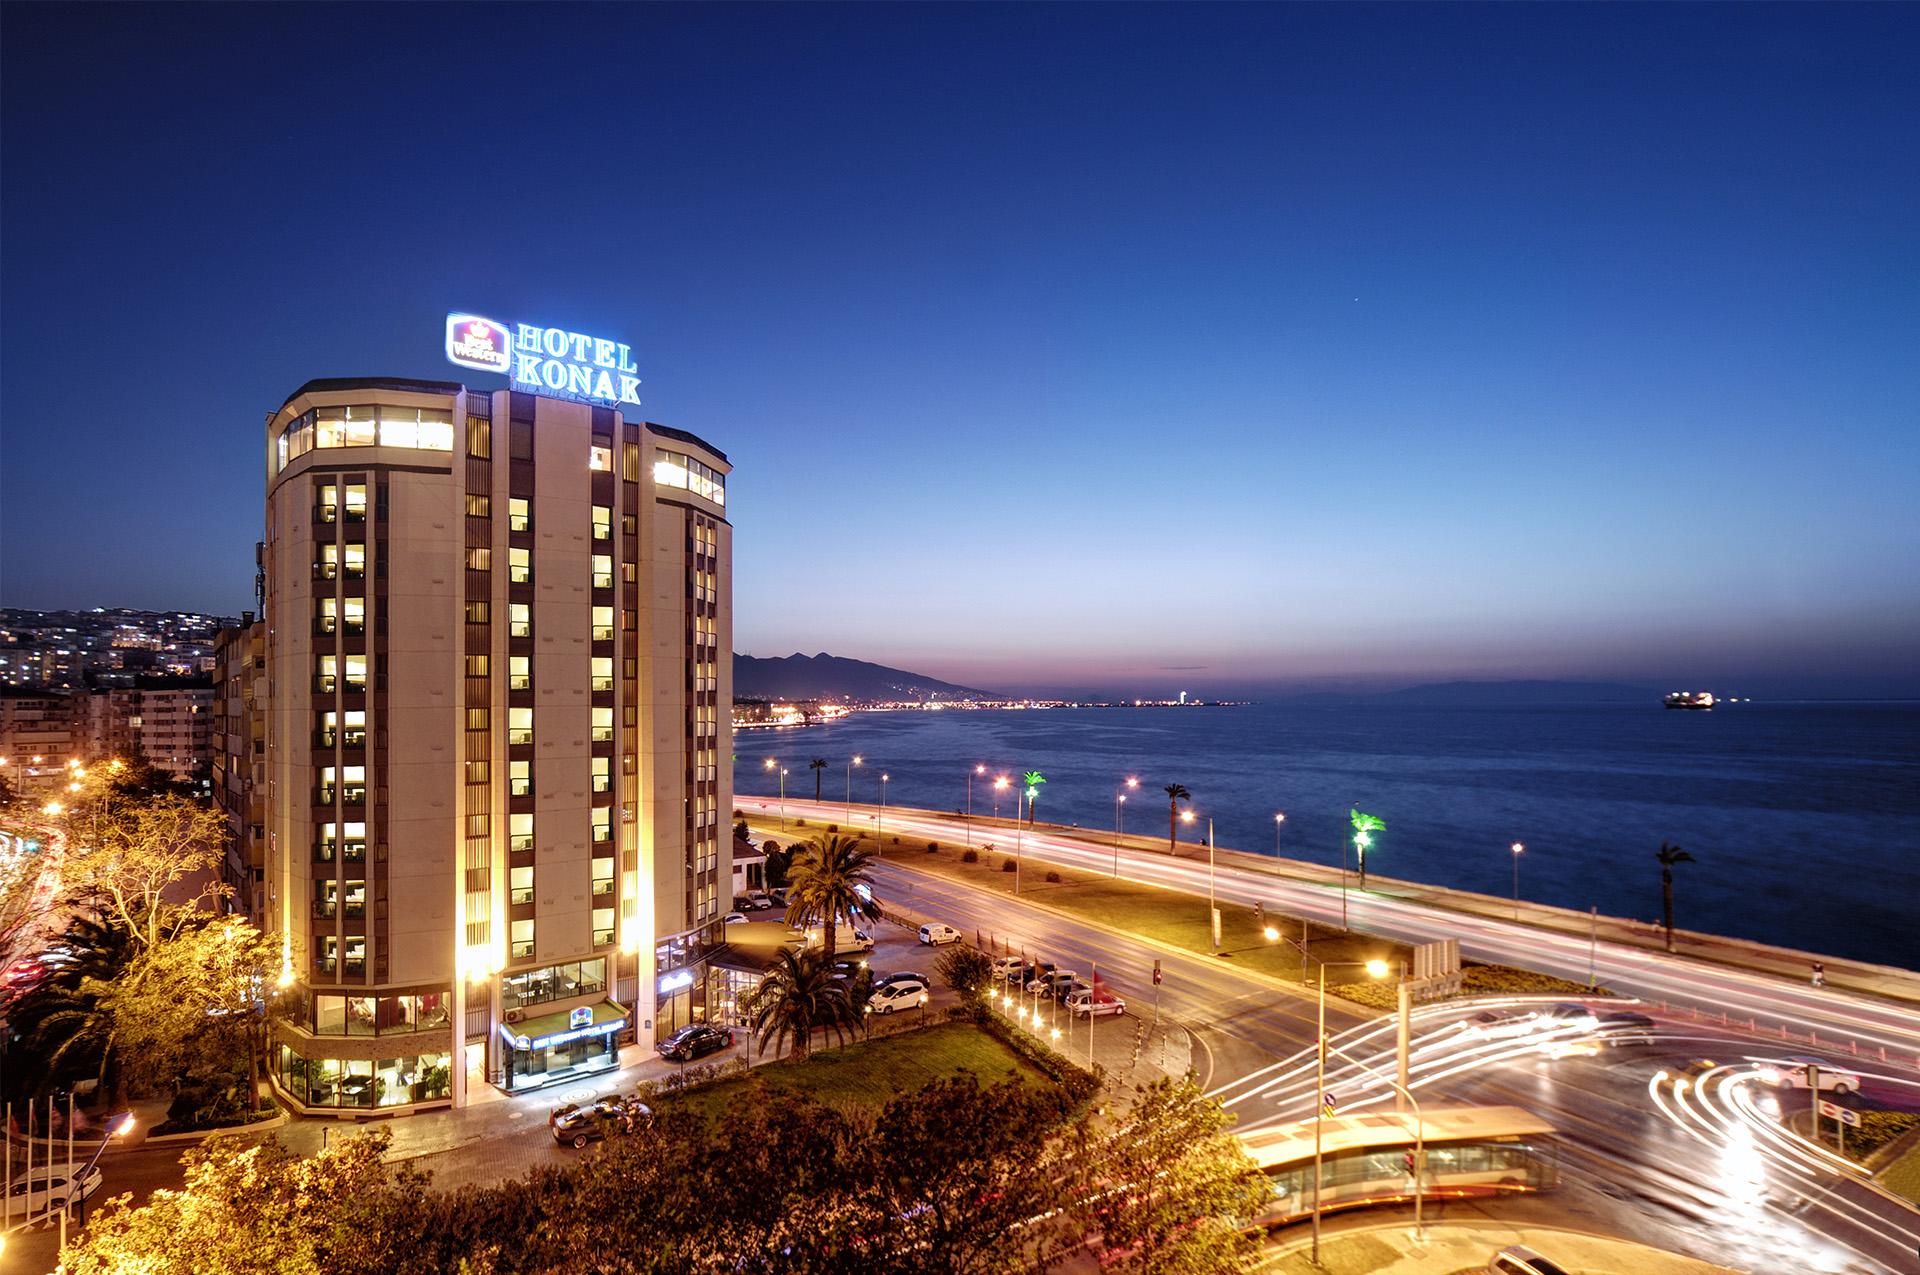 Best Western Konak İzmir